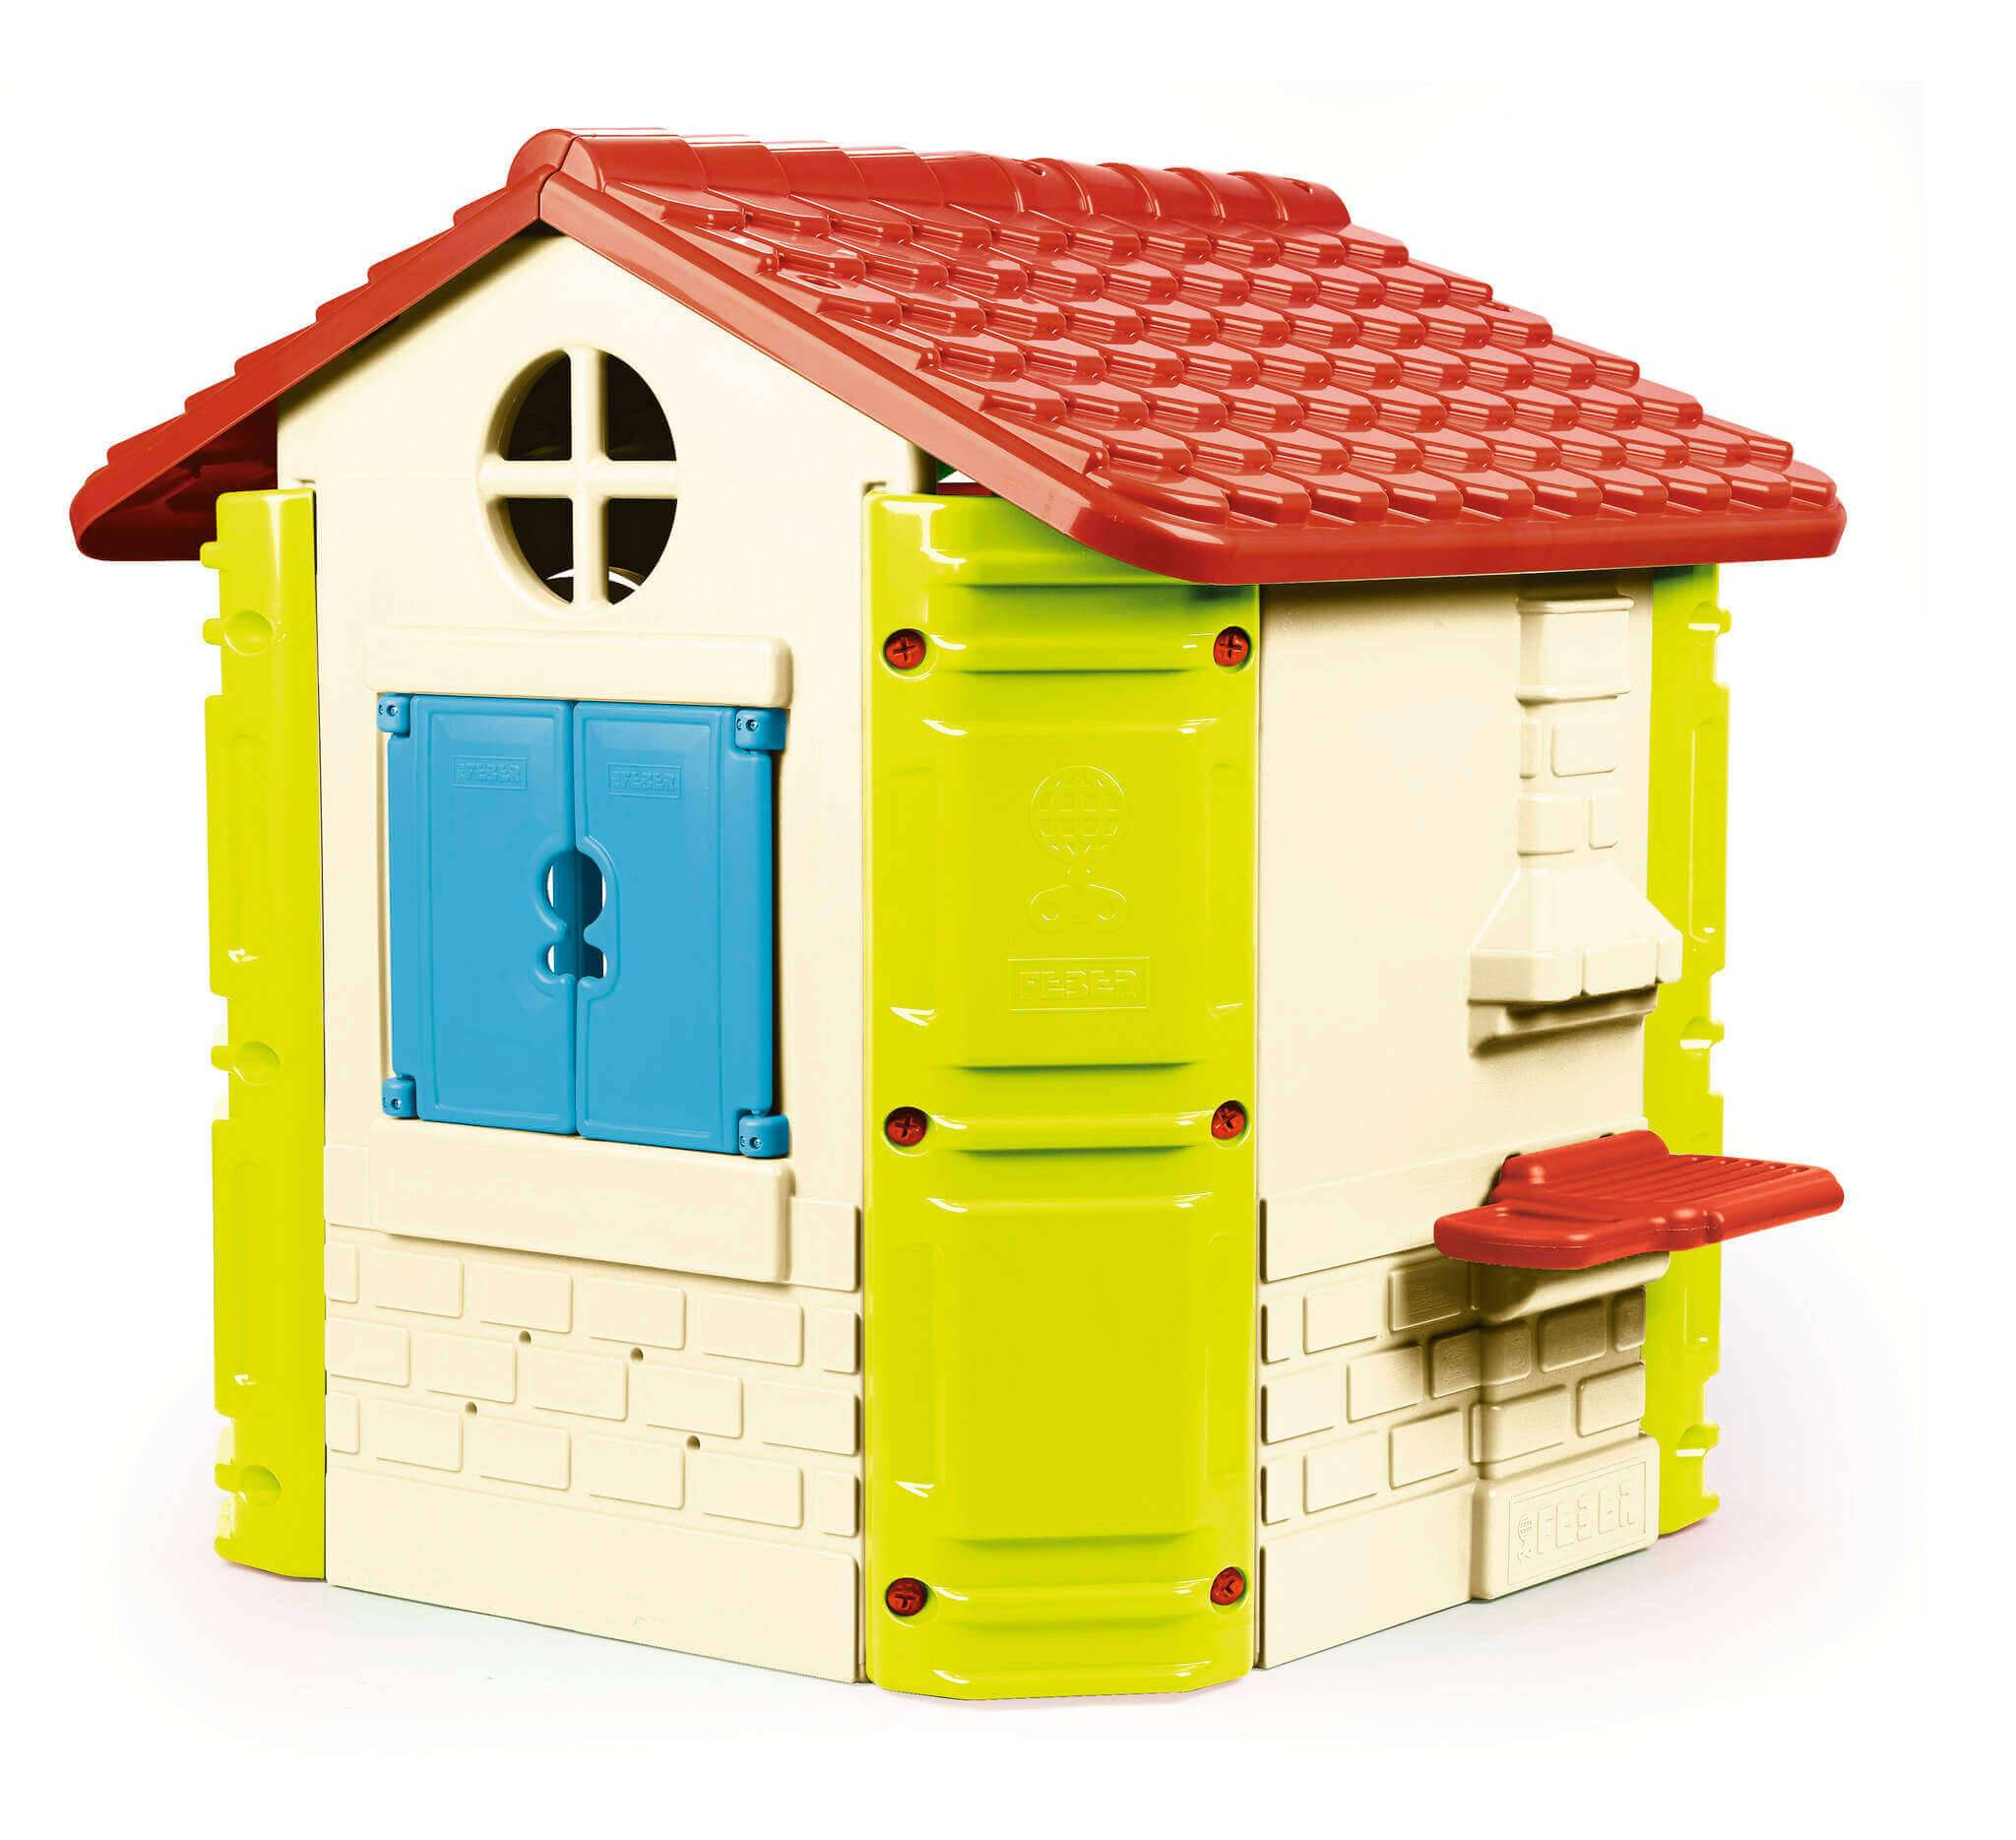 milani home house - casetta da giardino per bambini